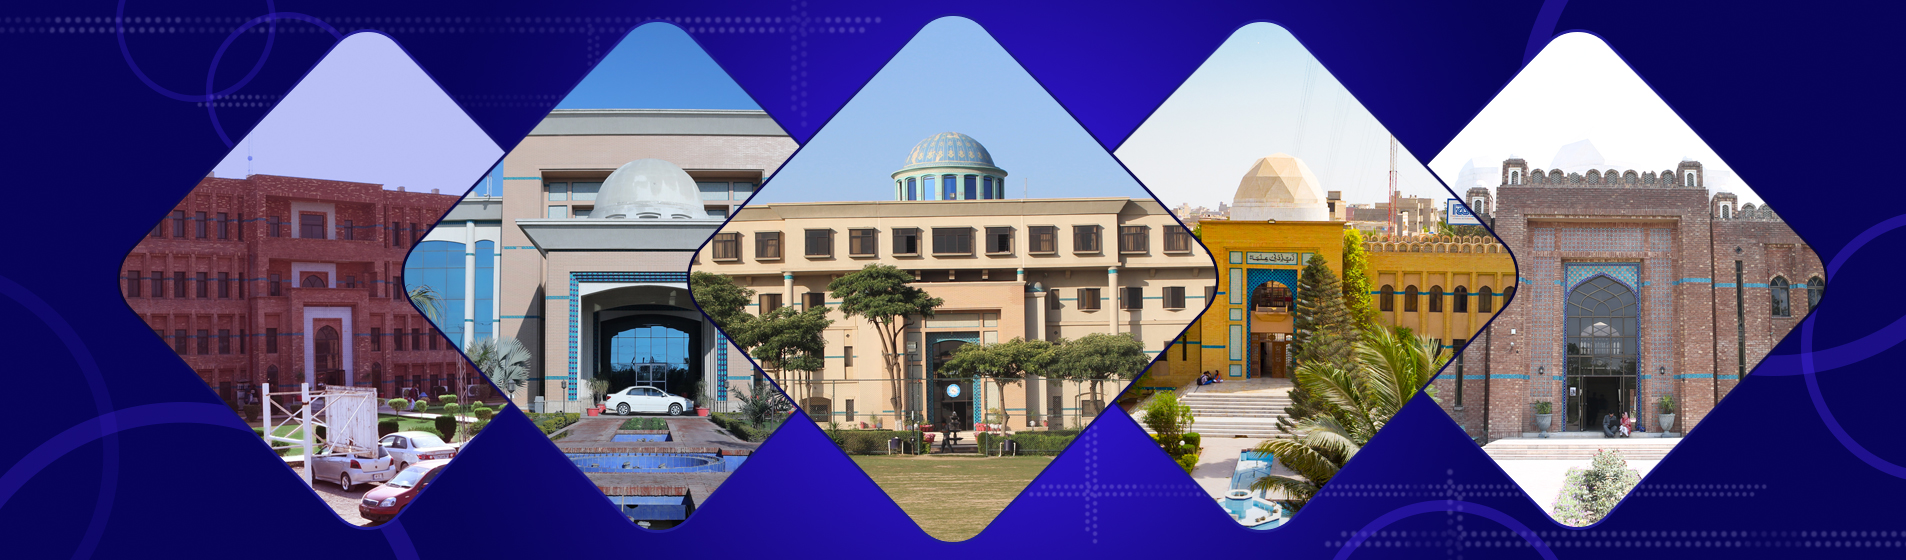 FAST National University